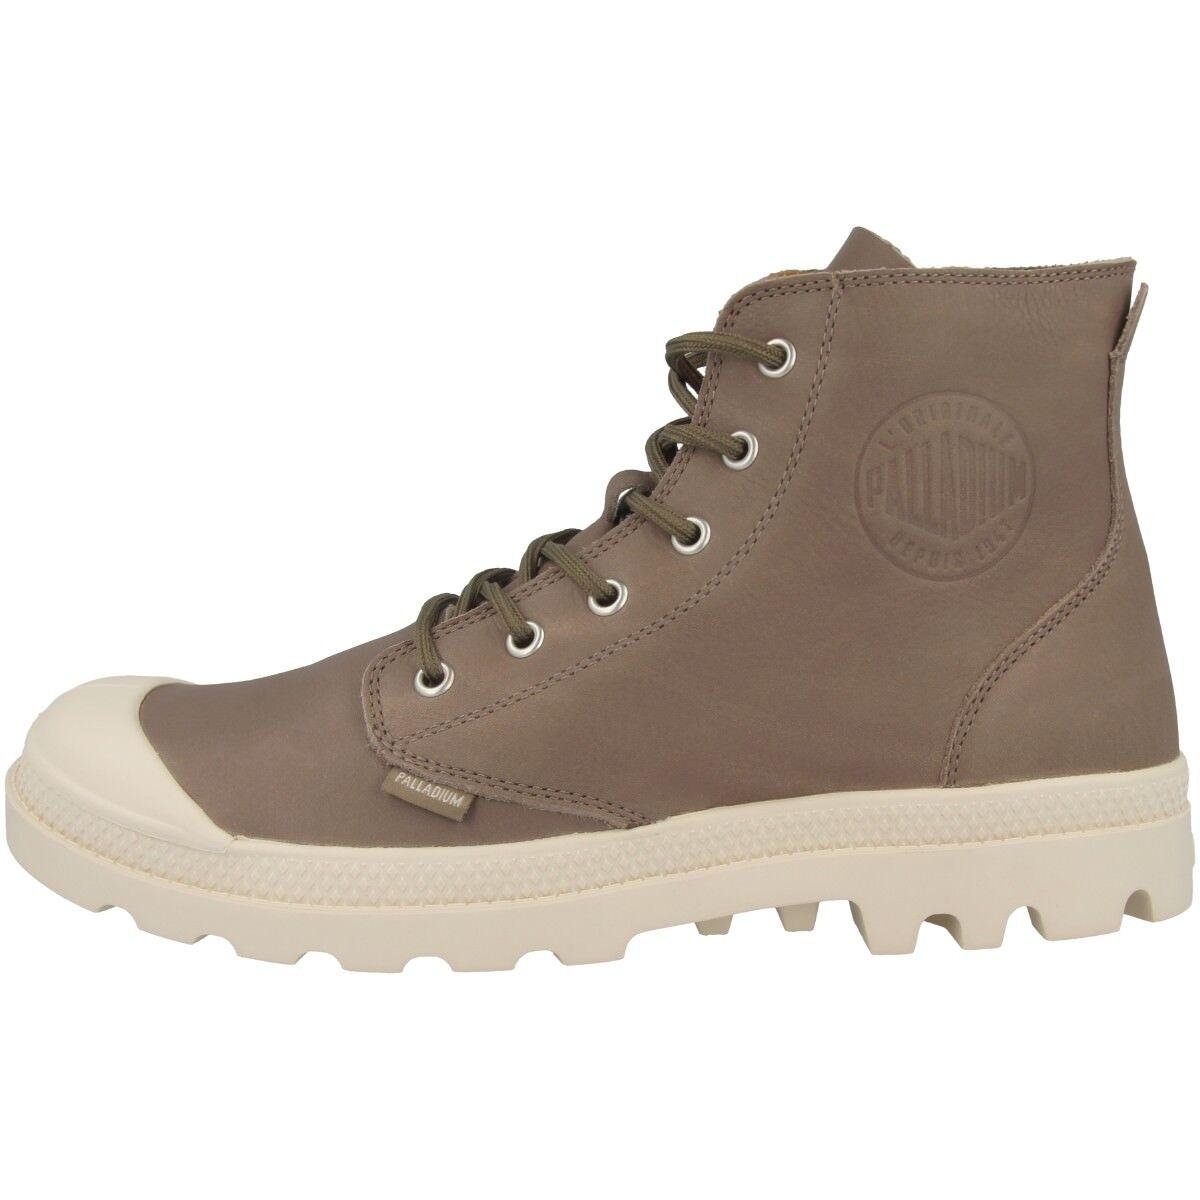 Palladium Pampa Hi Leather UL Boots Schuhe High Top Unisex Sneaker 75750-206